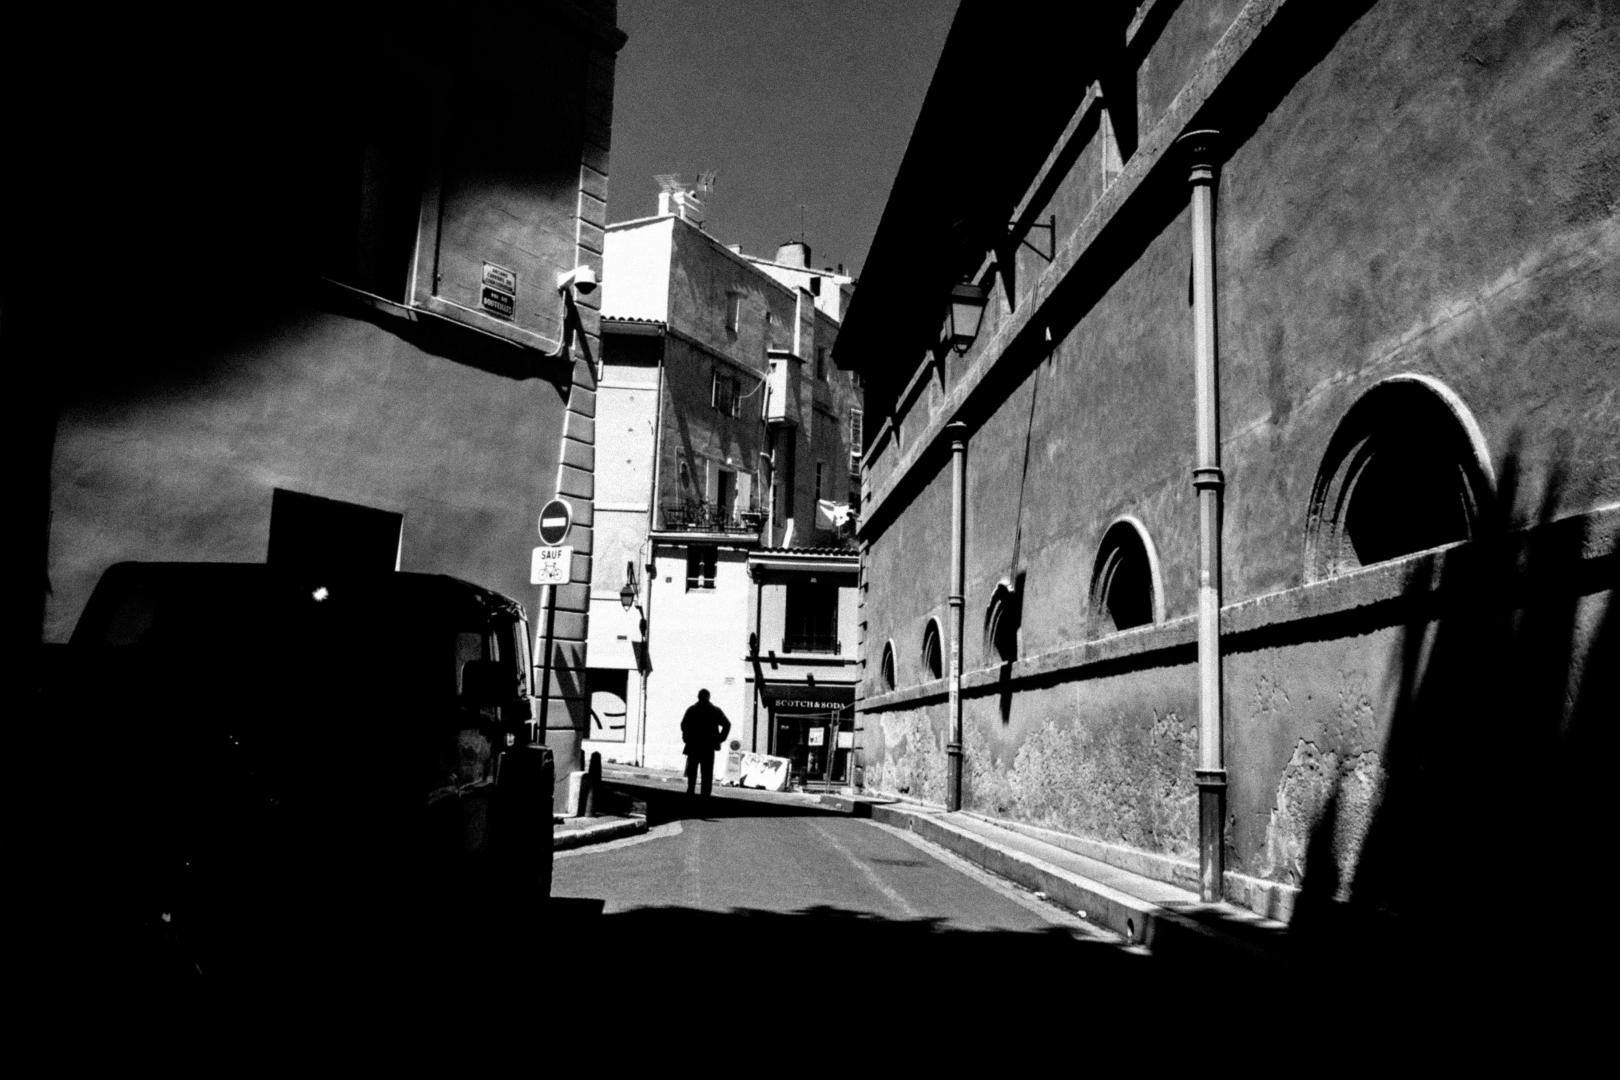 jeff-chane-mouye-street-photography-Aix-en-Provence-185